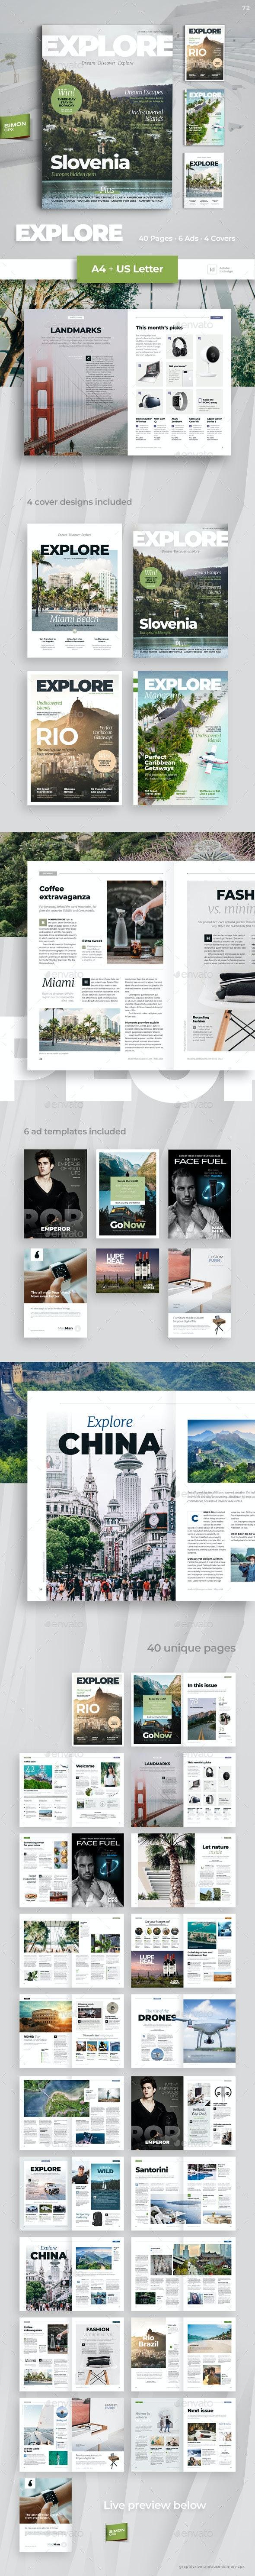 Explore Magazine - Magazines Print Templates